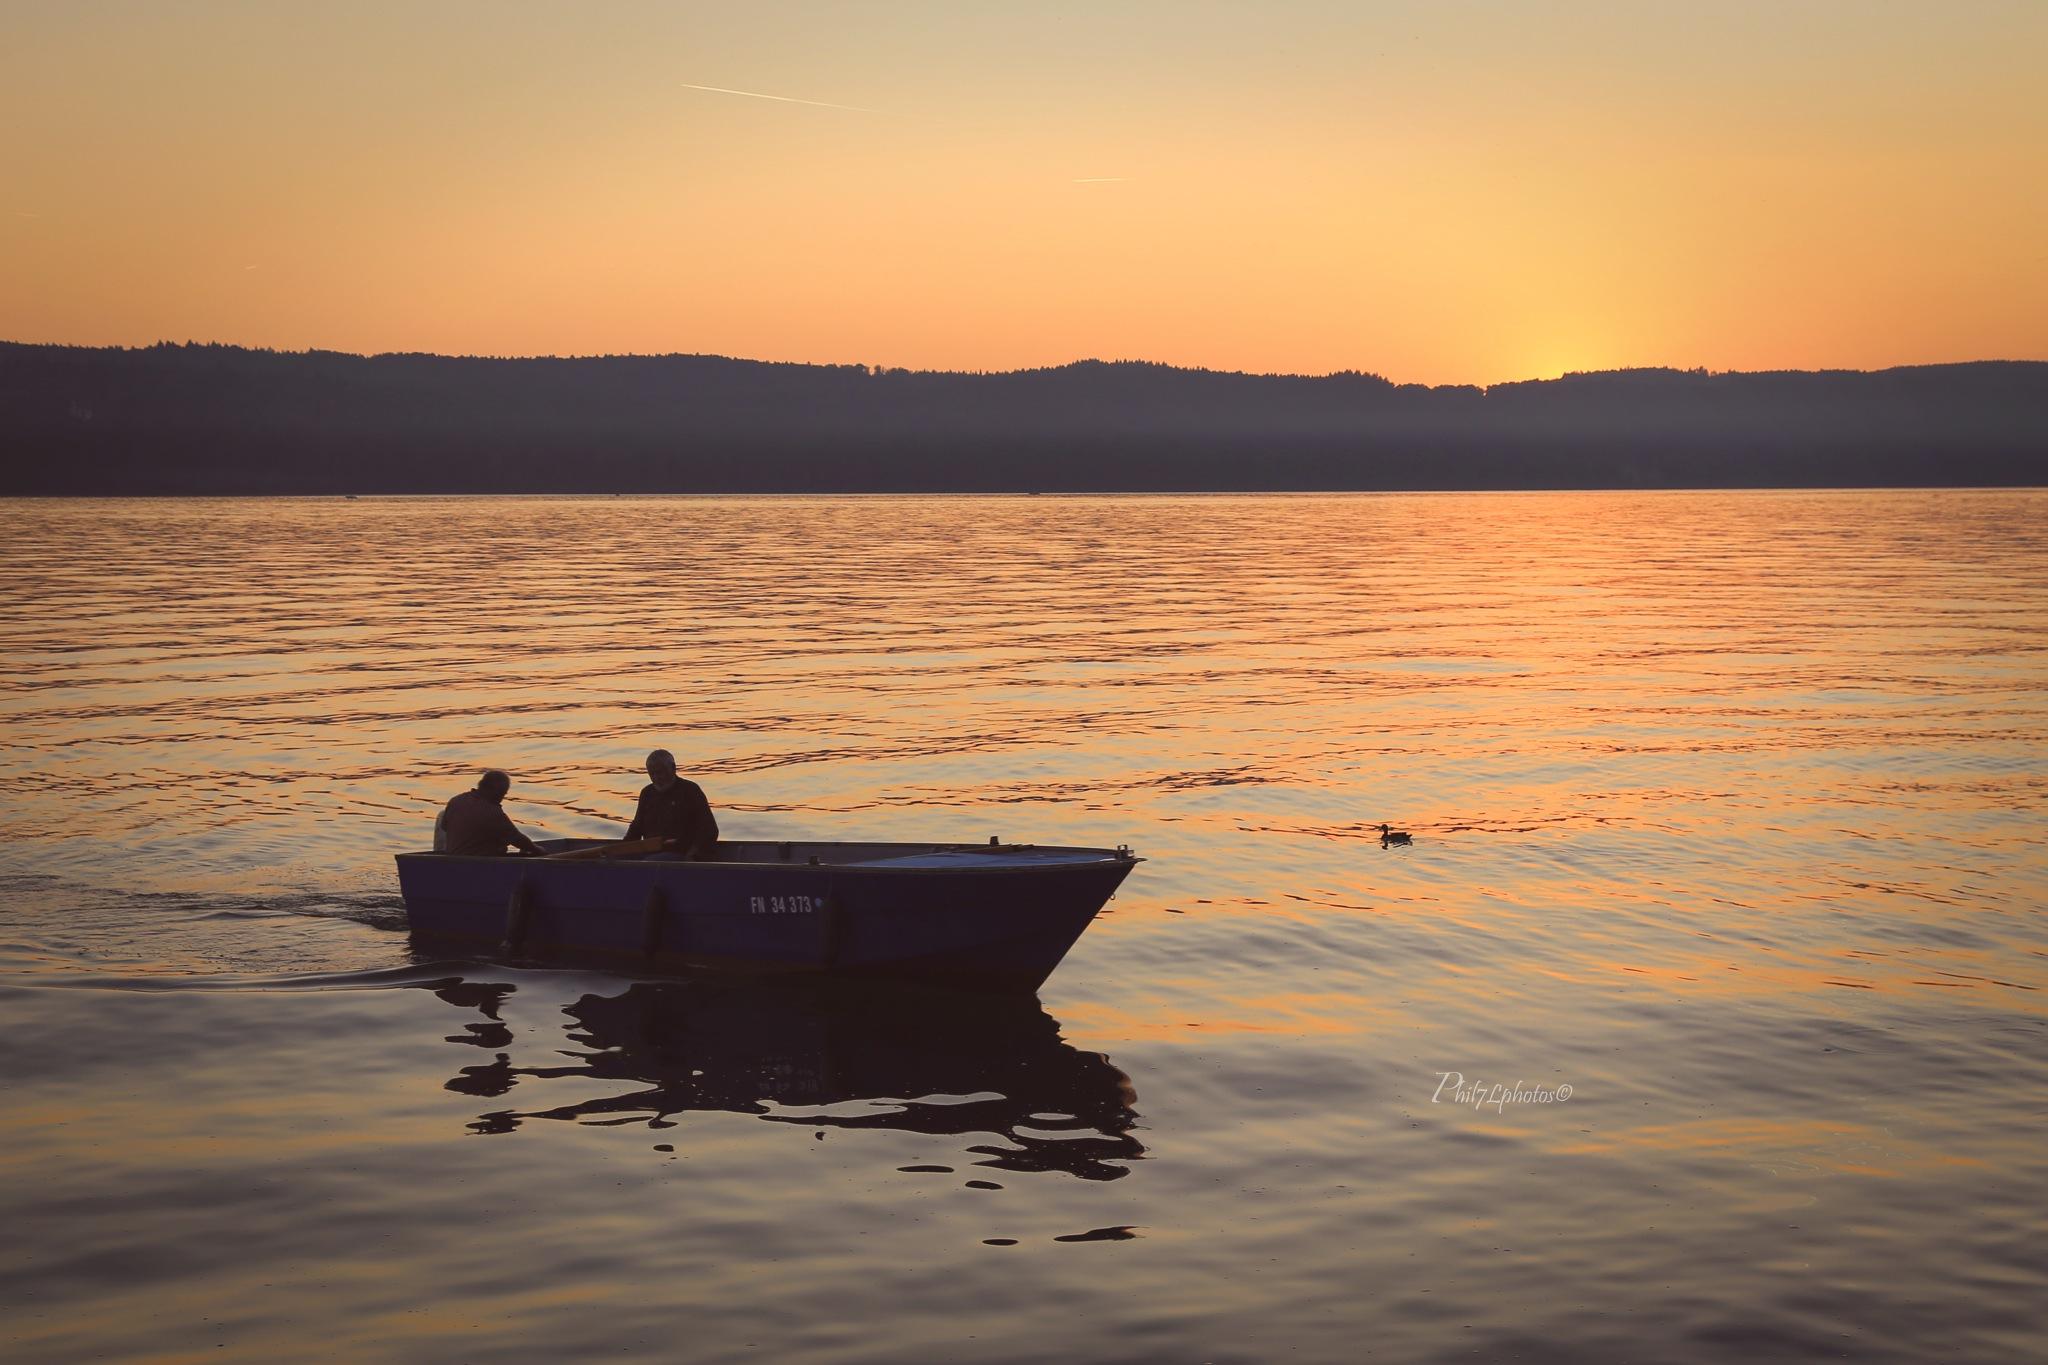 sunset and lake by Filippo Bomparola